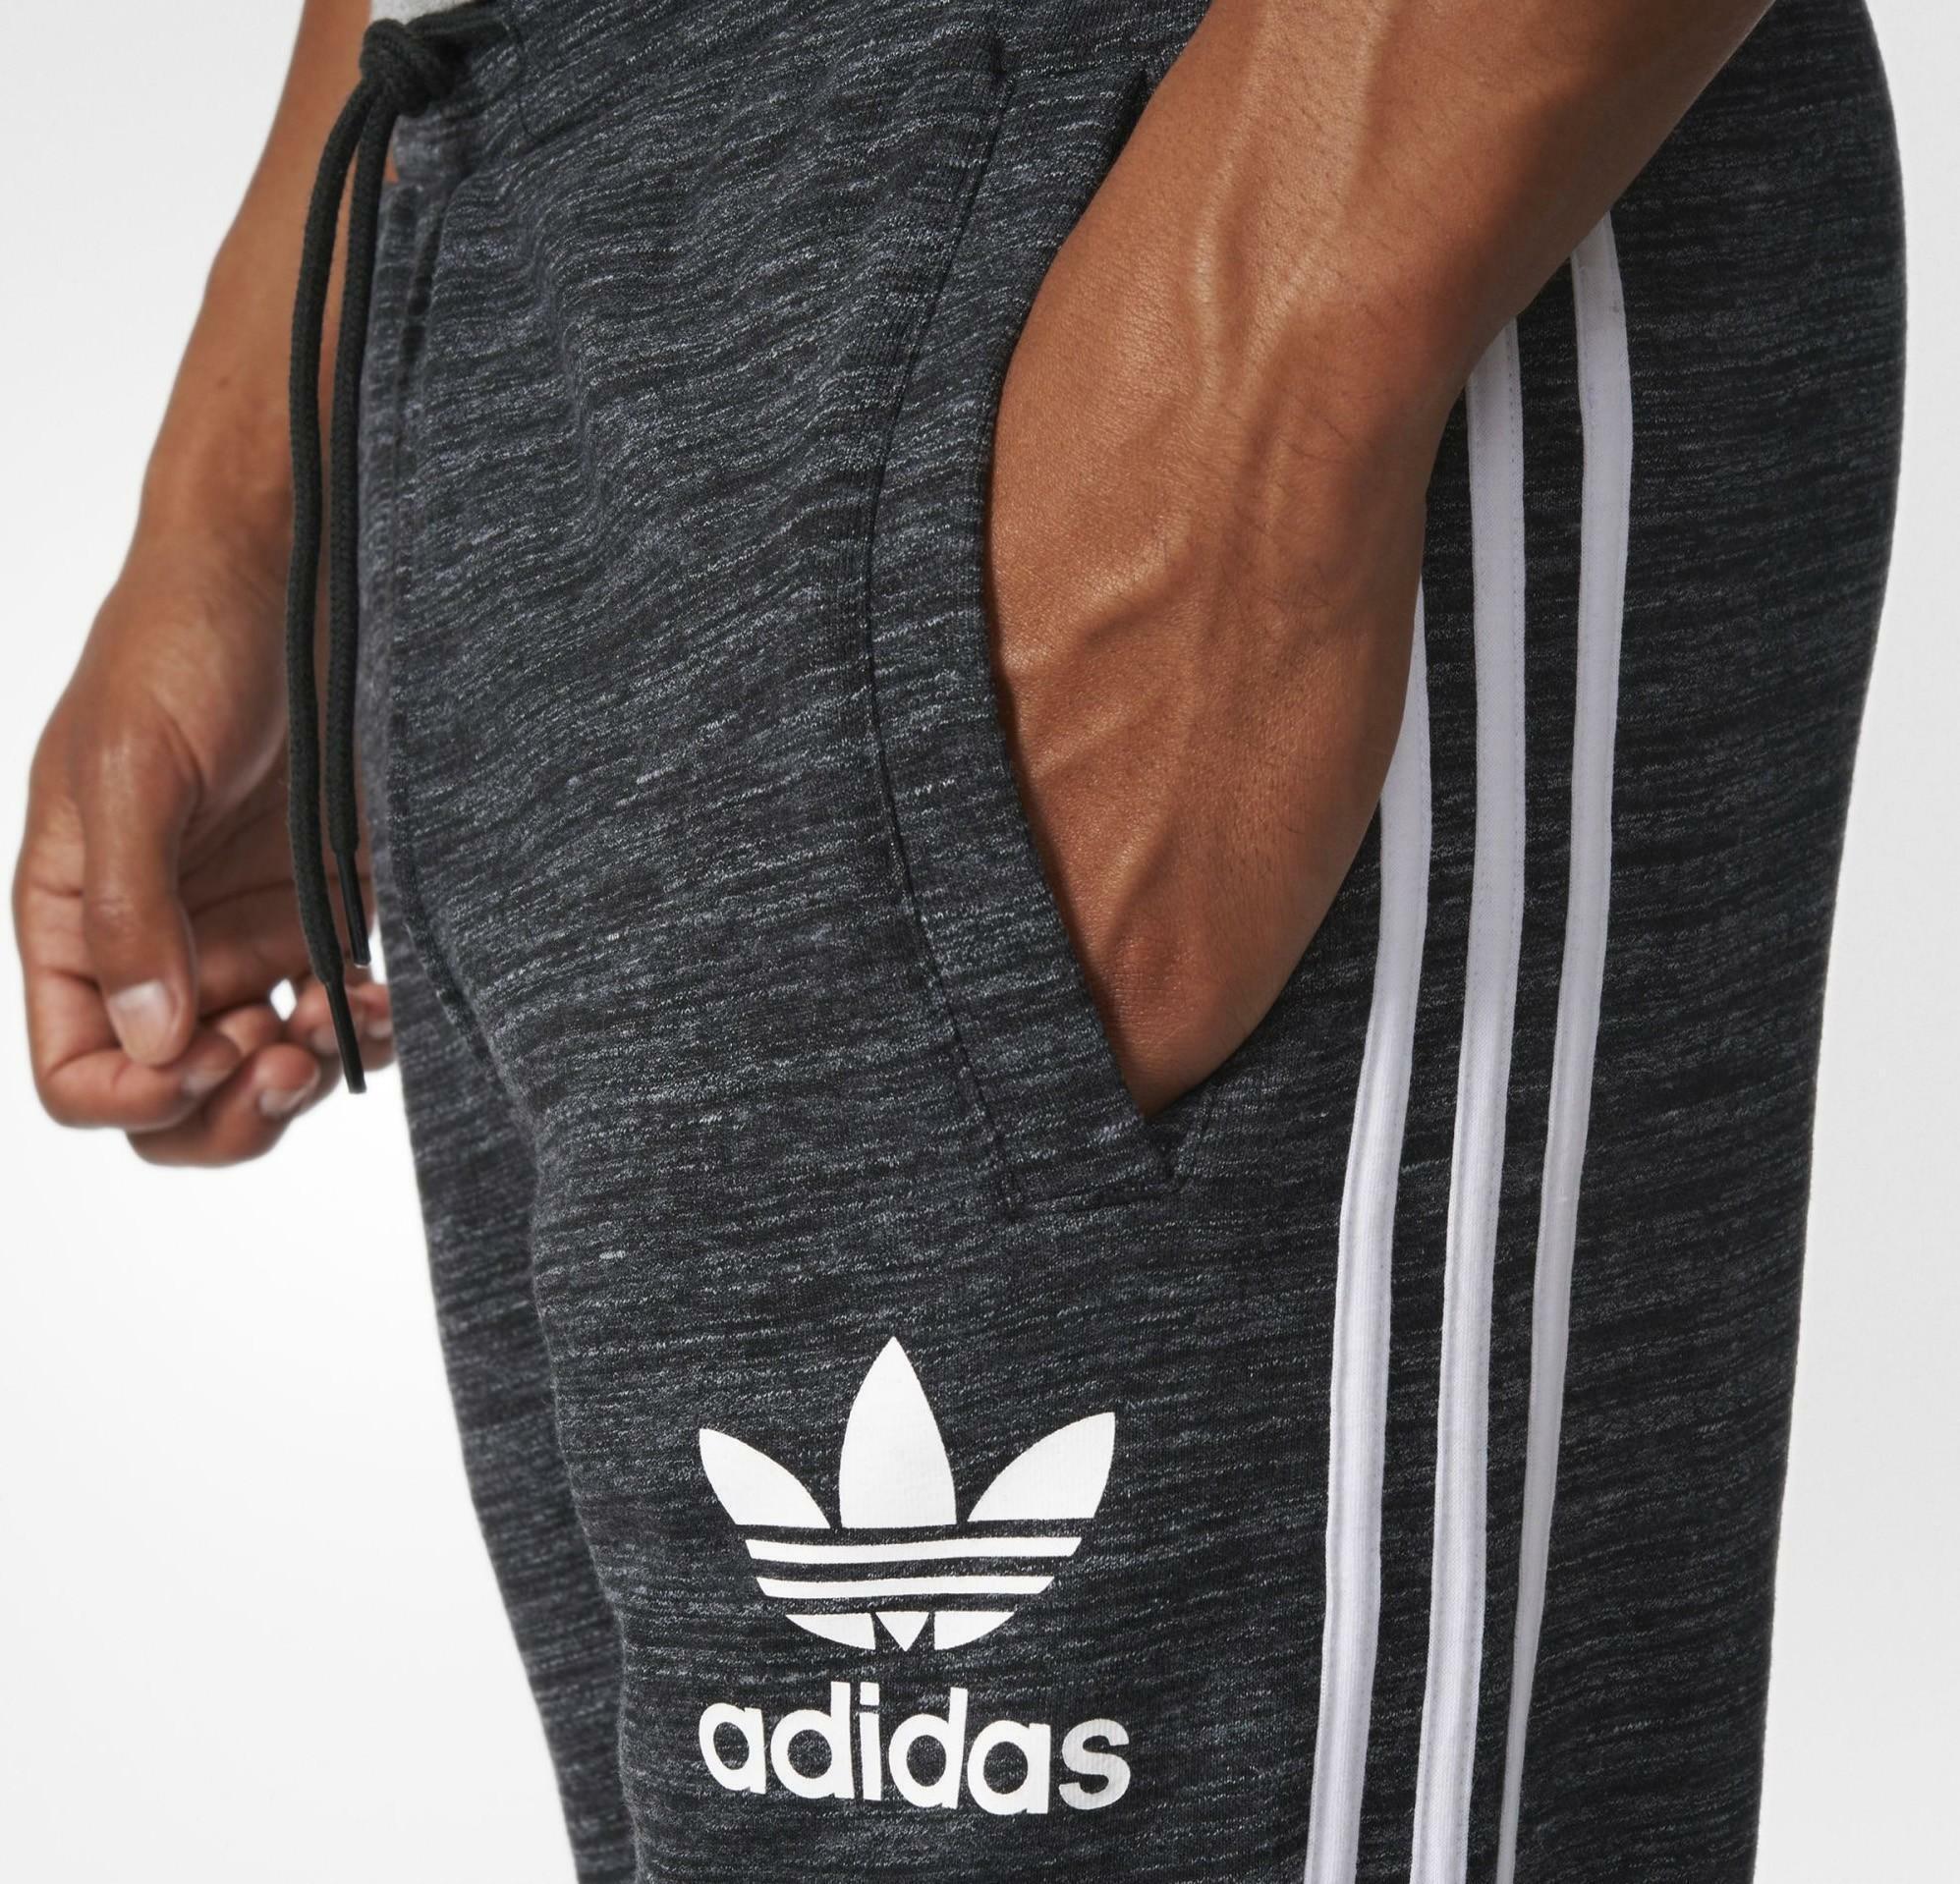 adidas originals clfn pantaloni tuta uomo grigi